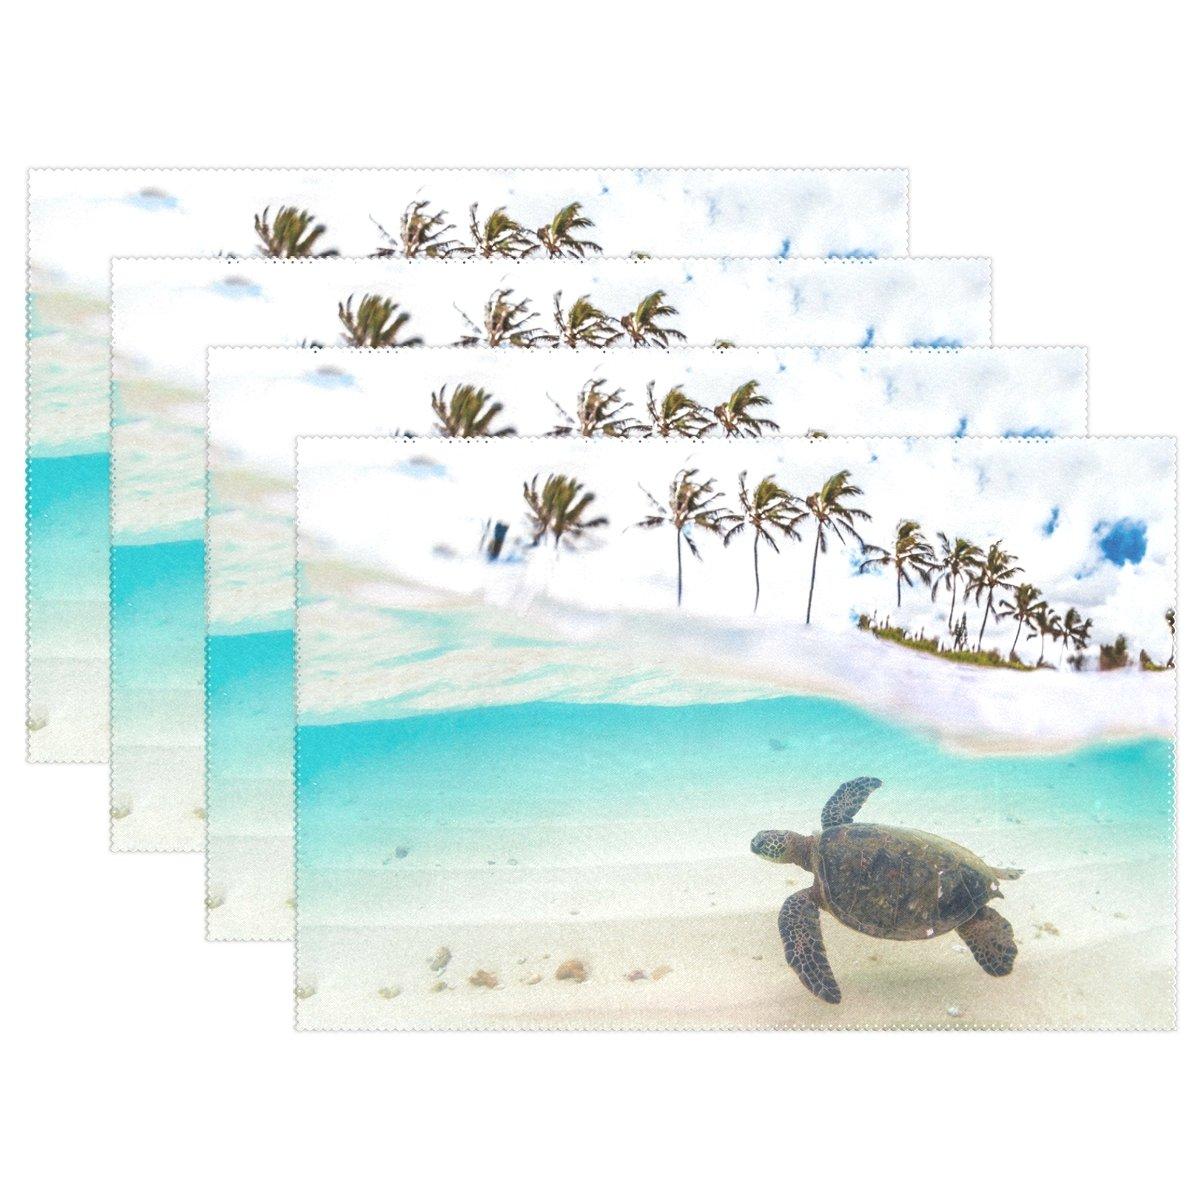 WozoハワイアンGreen Sea Turtleプレースマットテーブルマット、Tropical Palm Tree 12